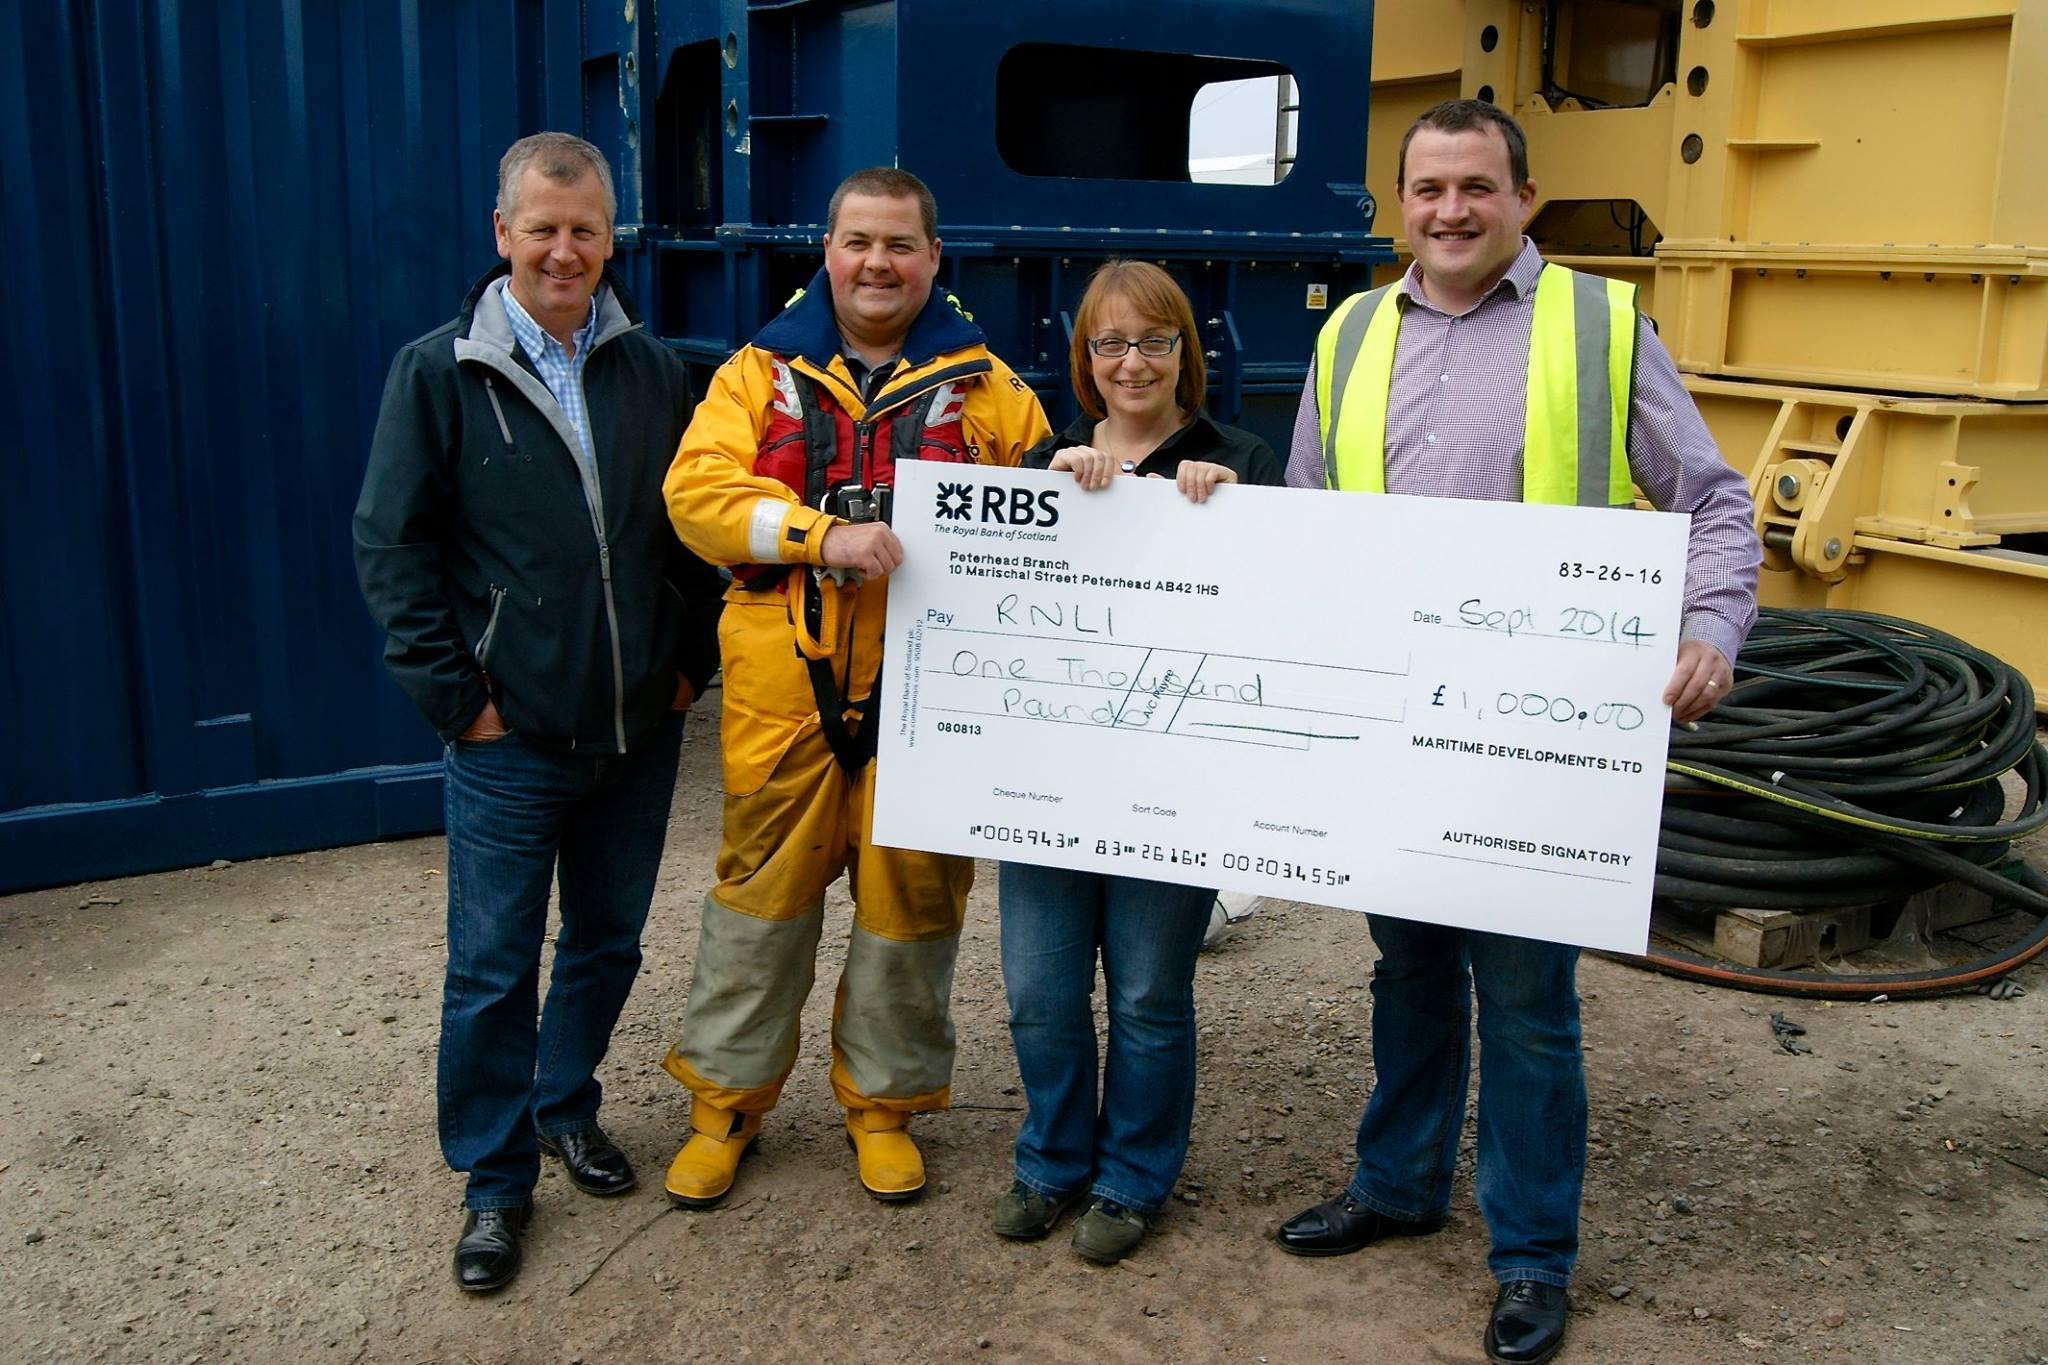 Maritime Developments' RNLI donation